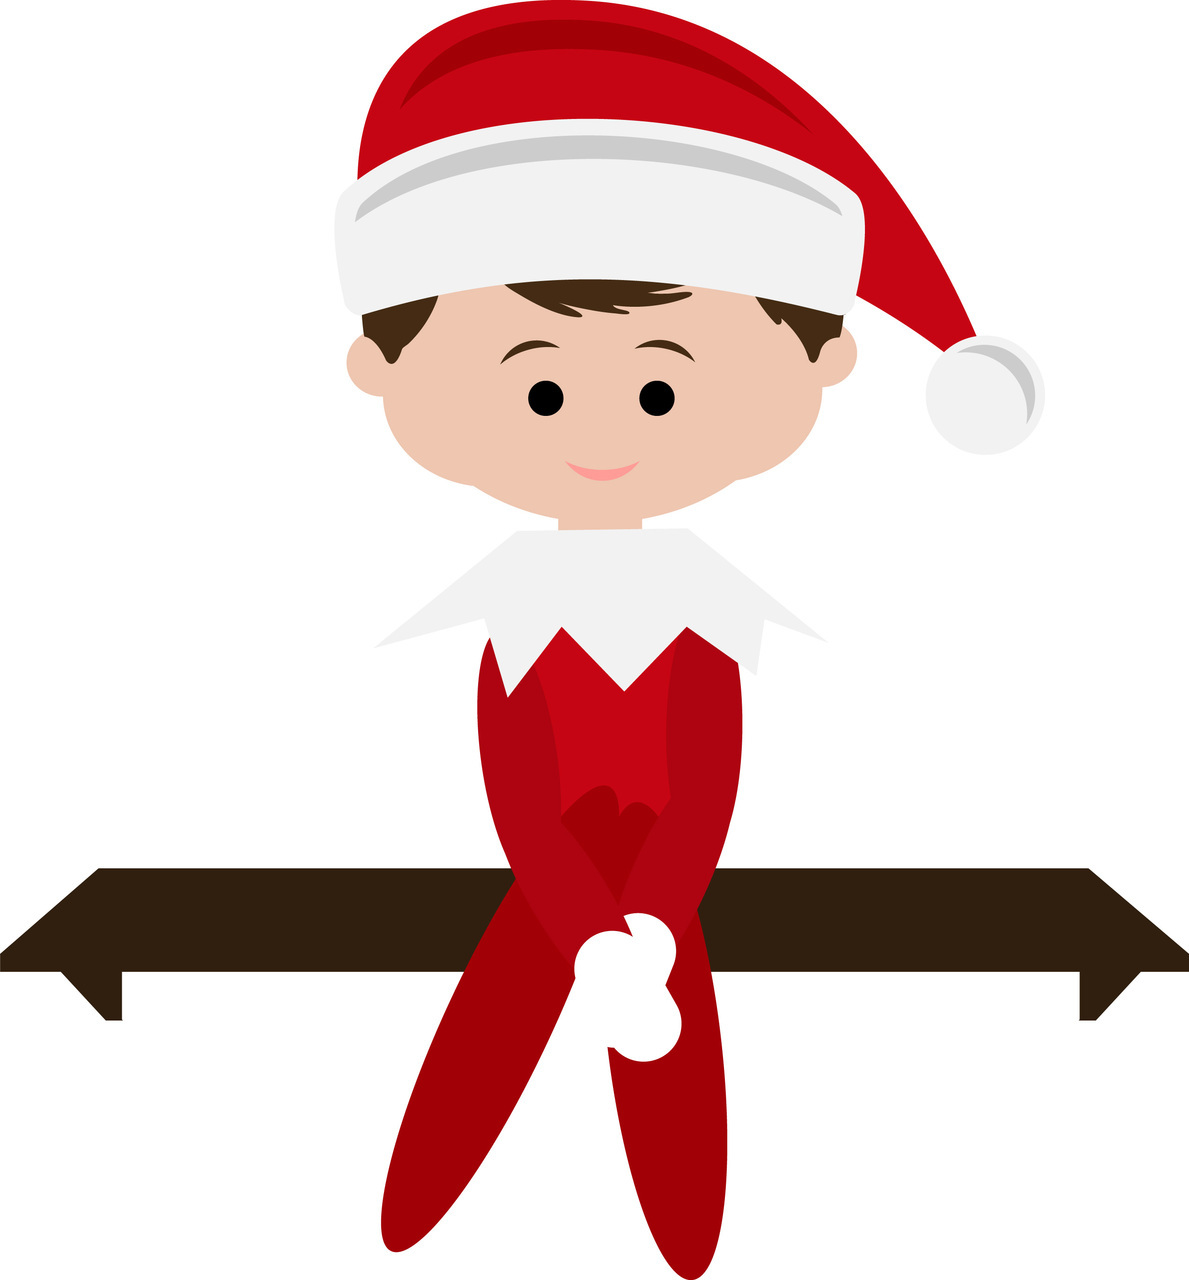 1189x1280 Christmas Elf Clipart On Christmas Elf Picasa And Elves Image 4